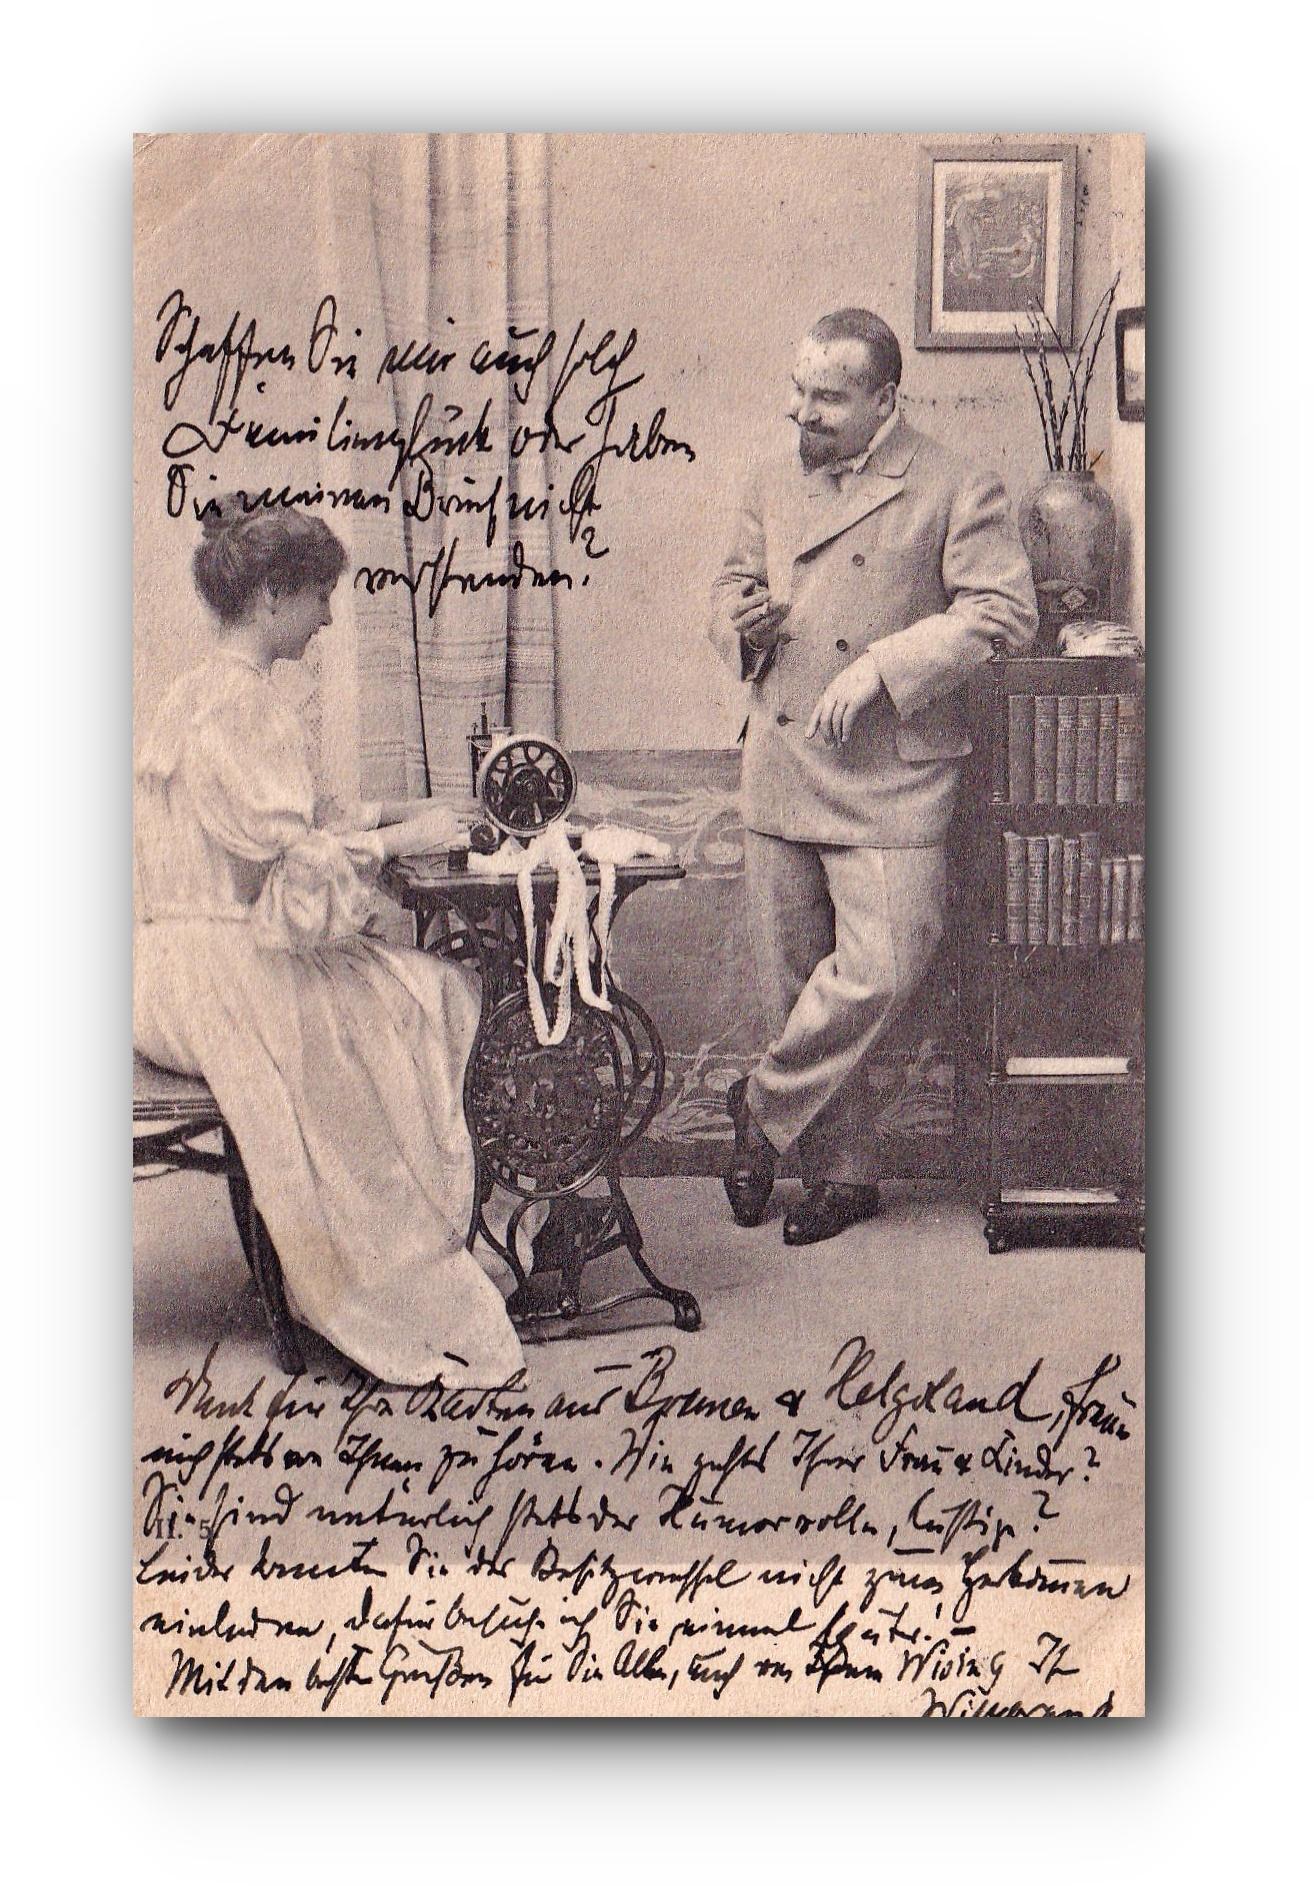 Die Näherin - 08.08.1908 - La couturière - The seamstress